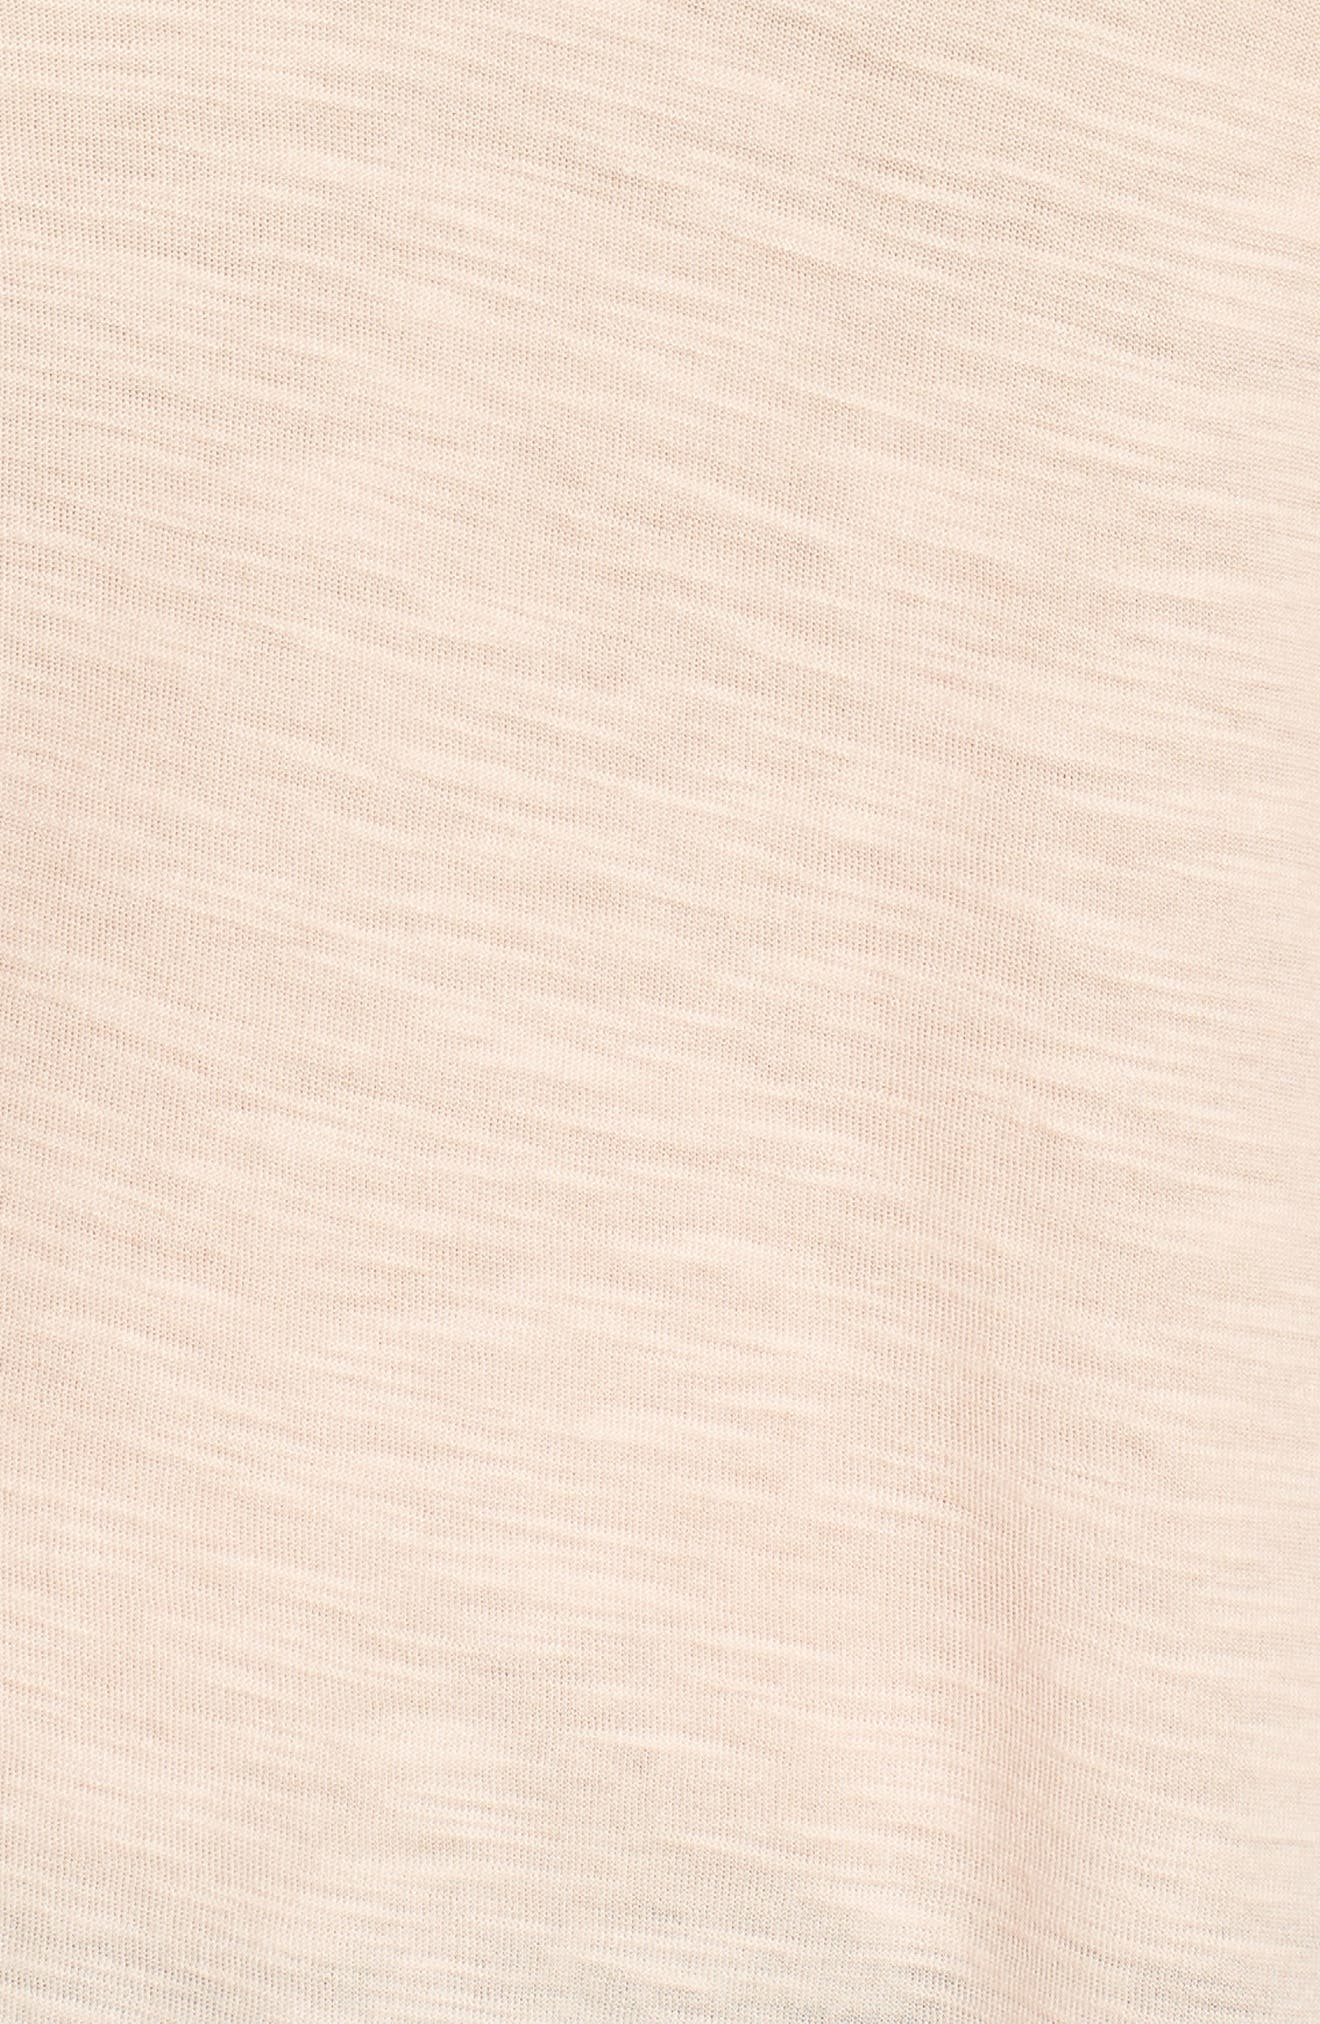 Ruffle Sleeve Mixed Media Top,                             Alternate thumbnail 6, color,                             French Peach